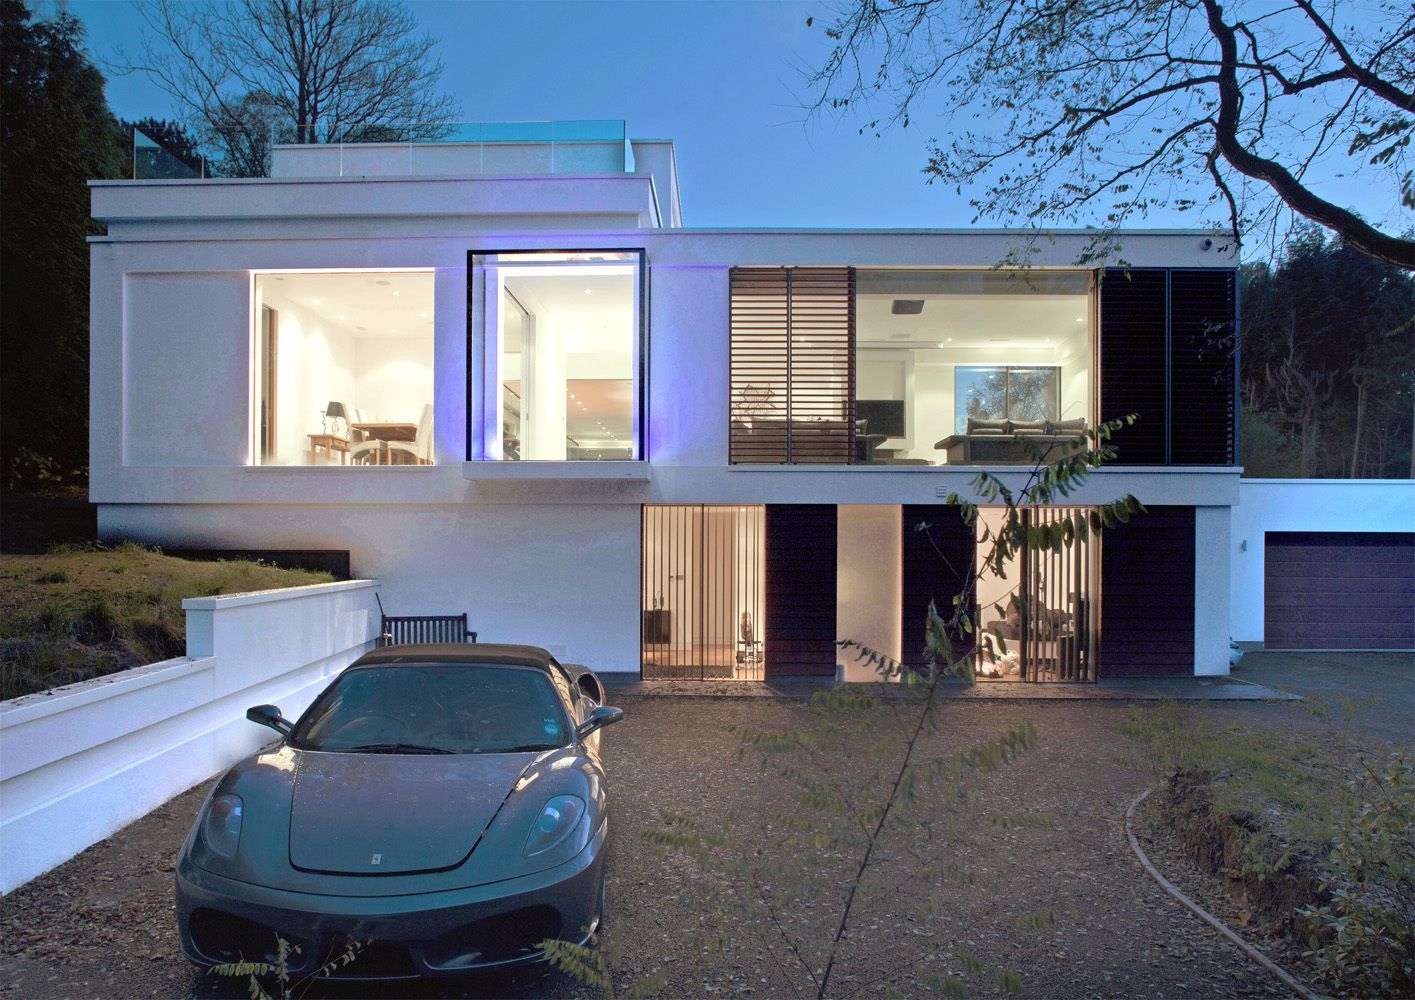 51b9e72ab3fc4b430e00000b_white-lodge-dyergrimes-architects_wl07logan